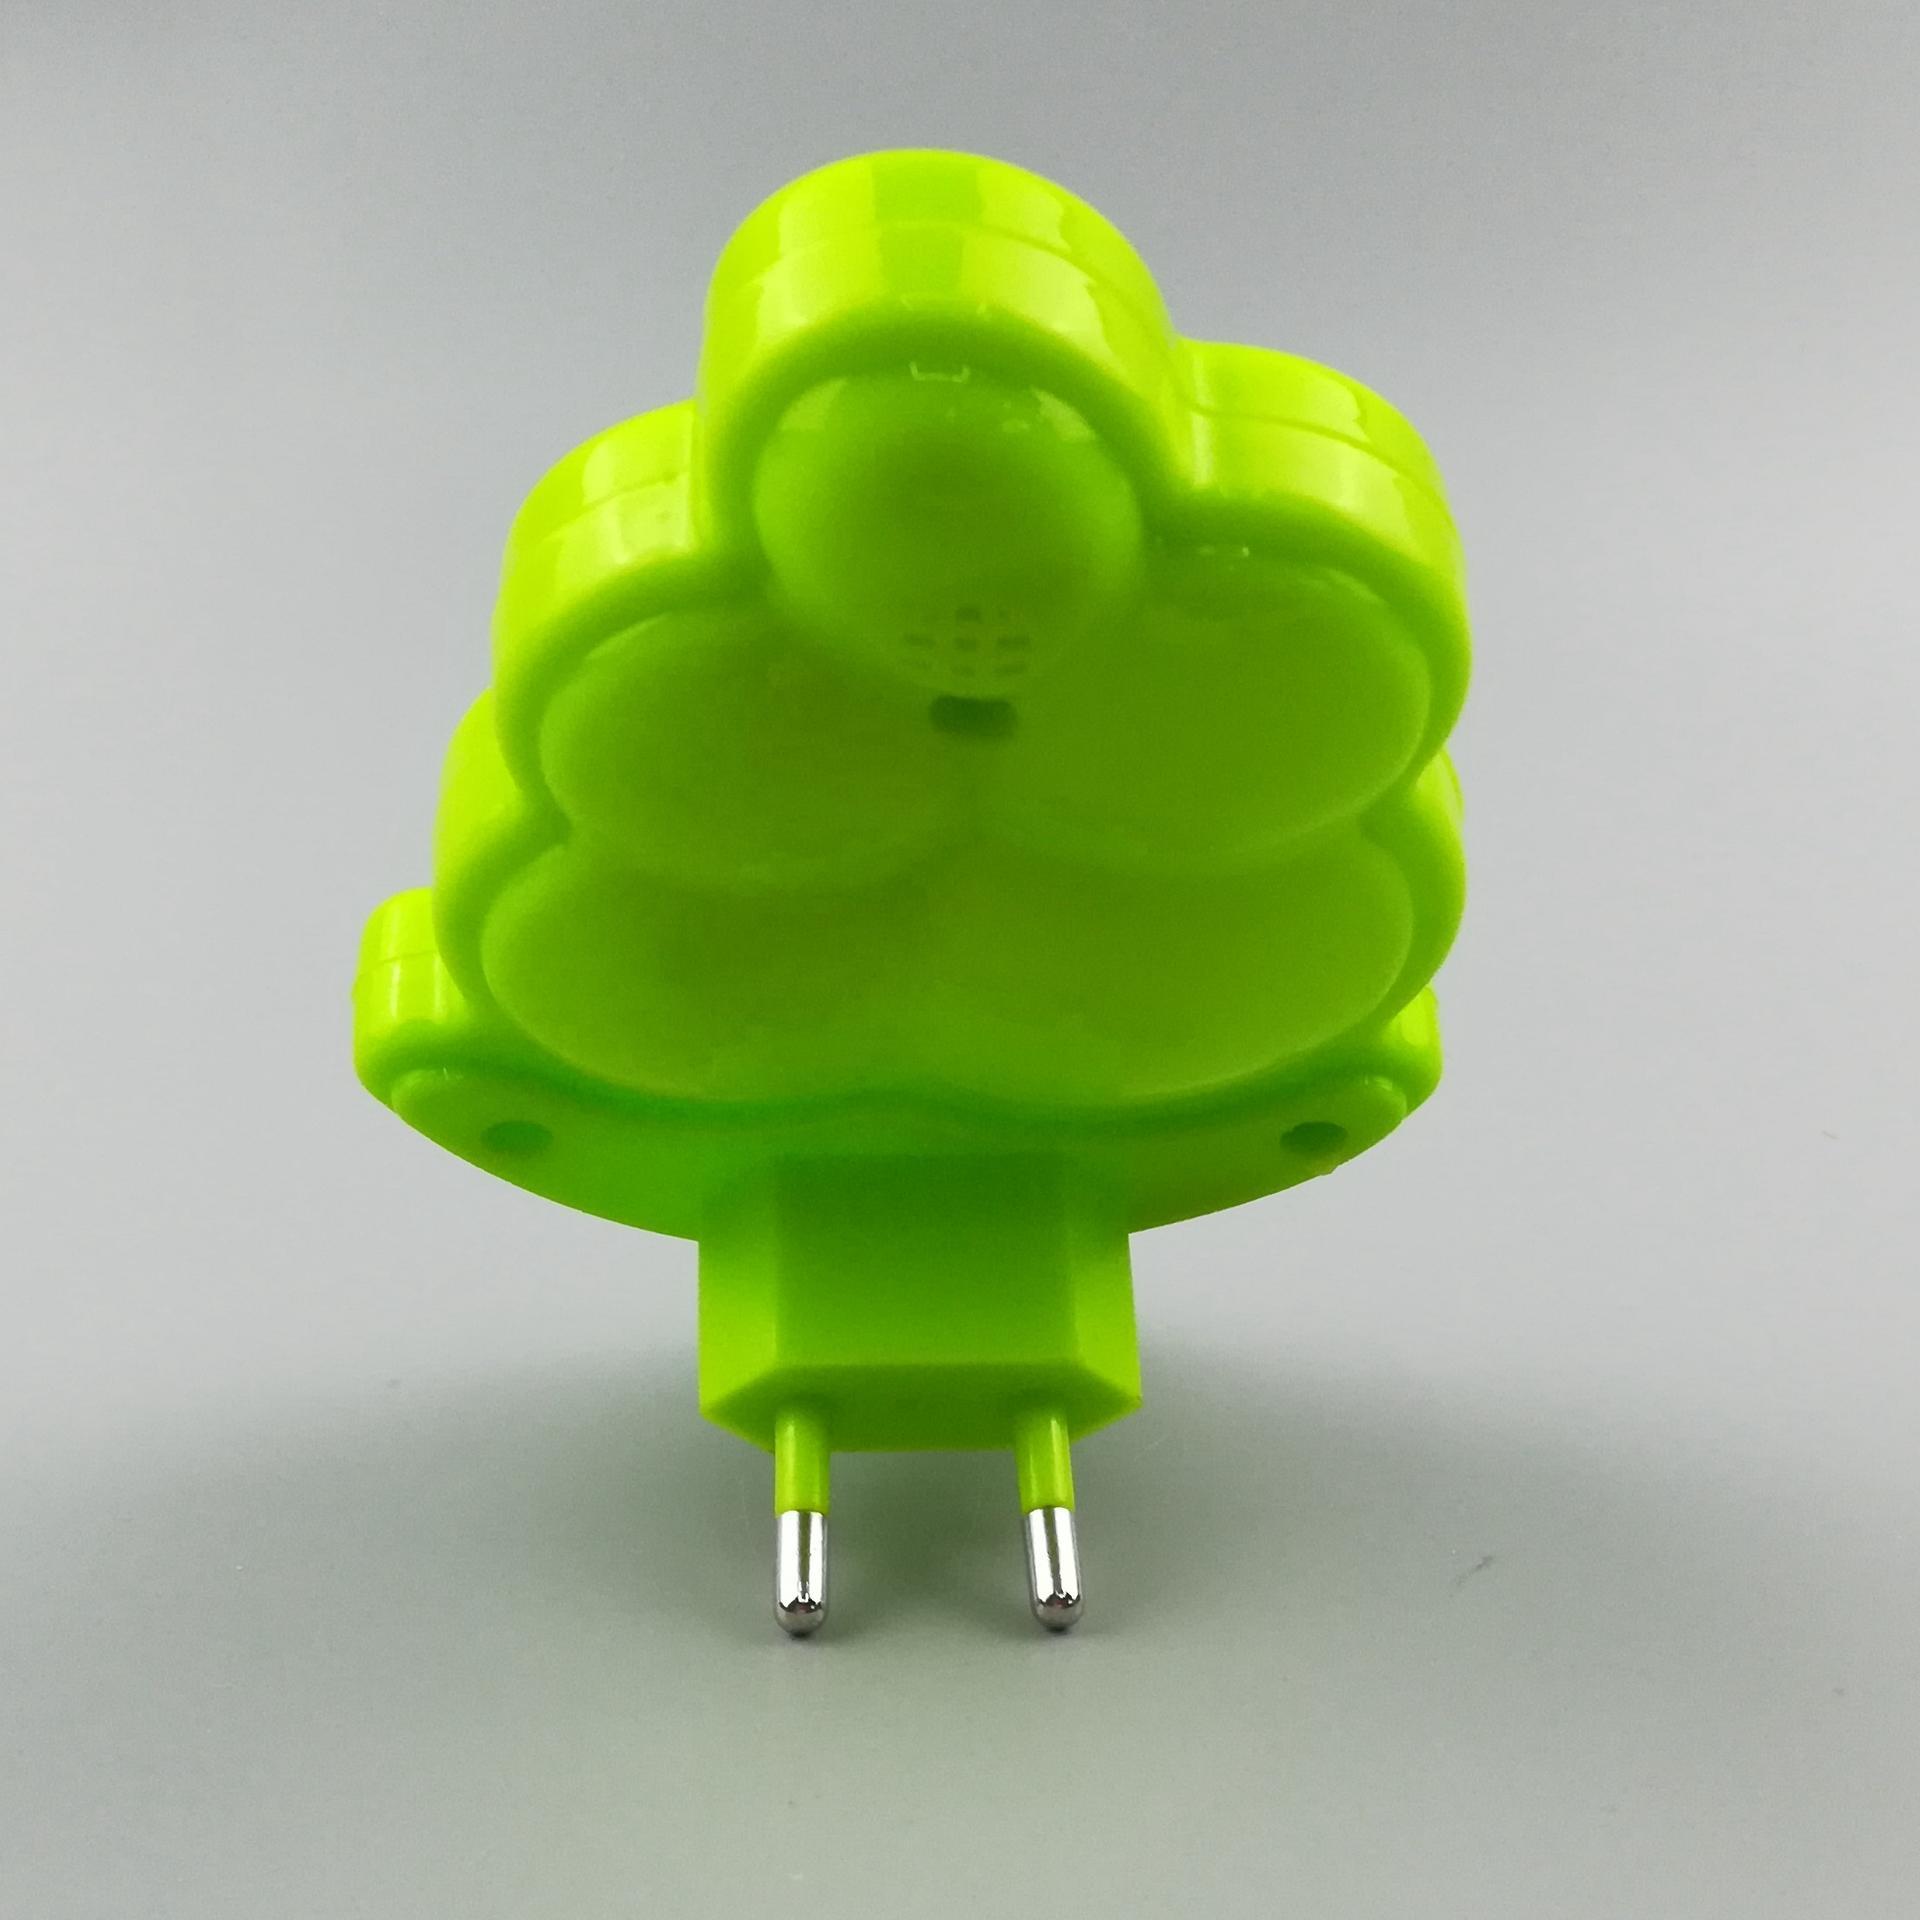 W084 Fruit grape shape LED mini switch plug in plastic LED night light with 0.6W and 110V or 220V